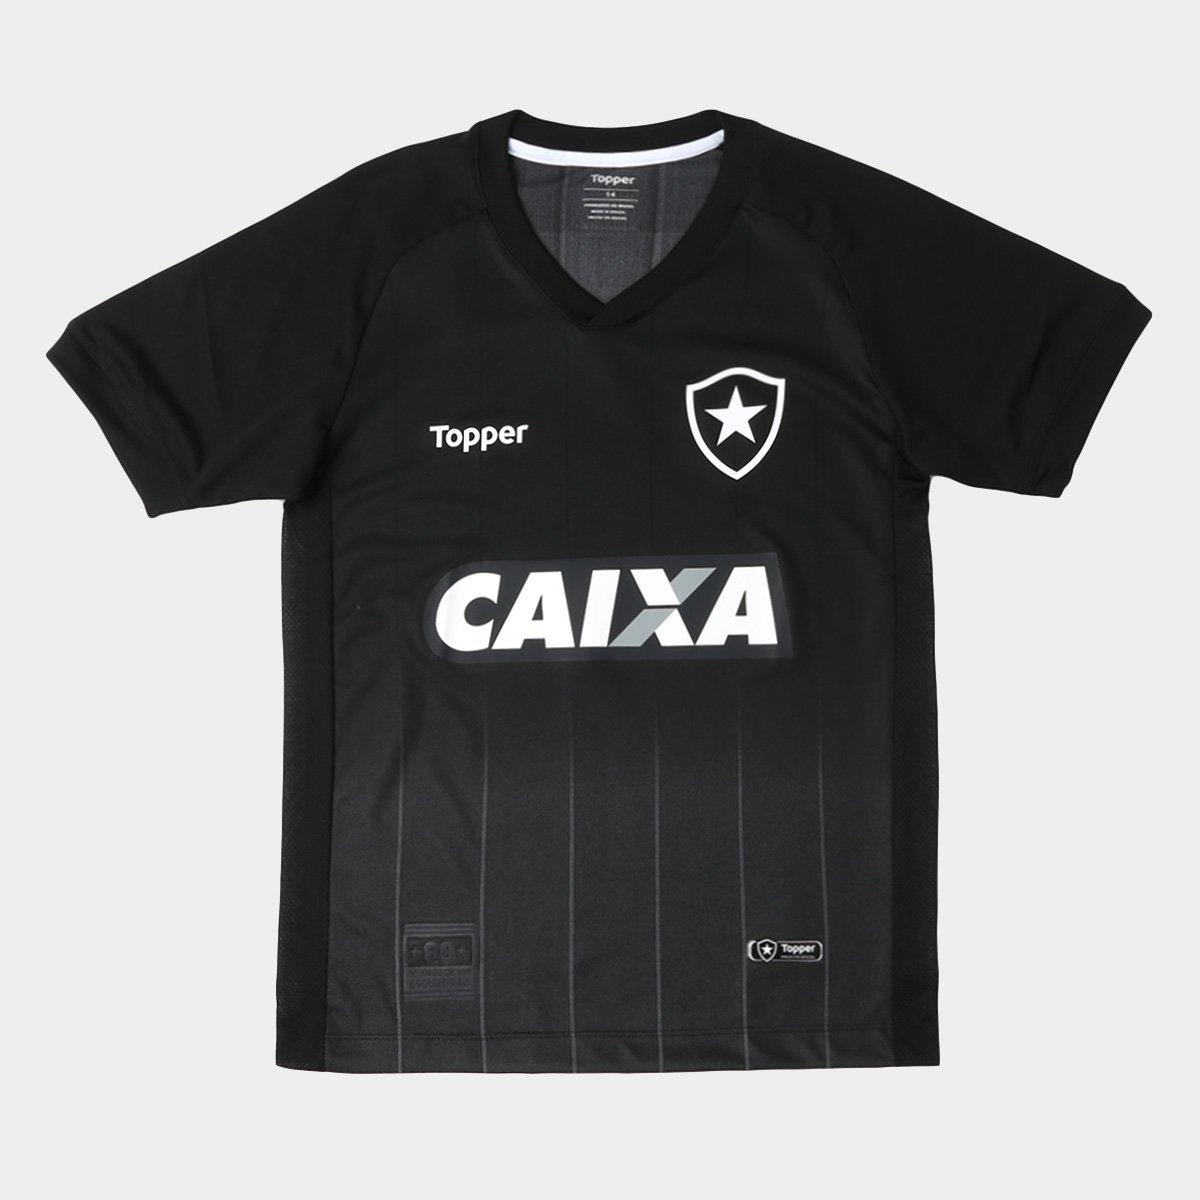 1c9ff1da3a Infantil Camisa Preto 2018 Torcedor n° Topper II s Botafogo Chumbo e  Hxx5gPZnC ...